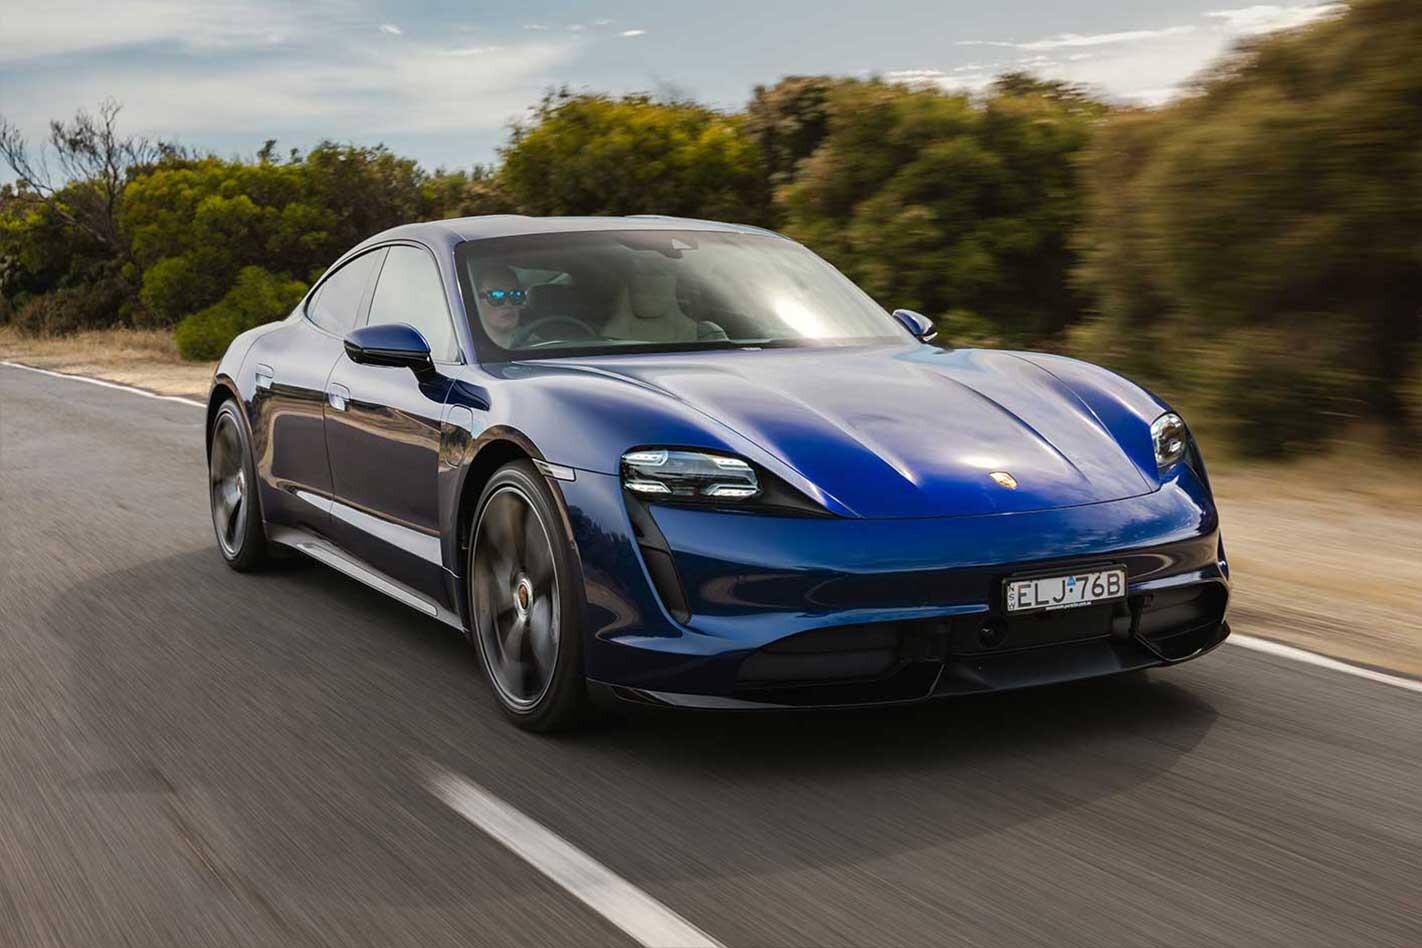 2021 Porsche Taycan Turbo review